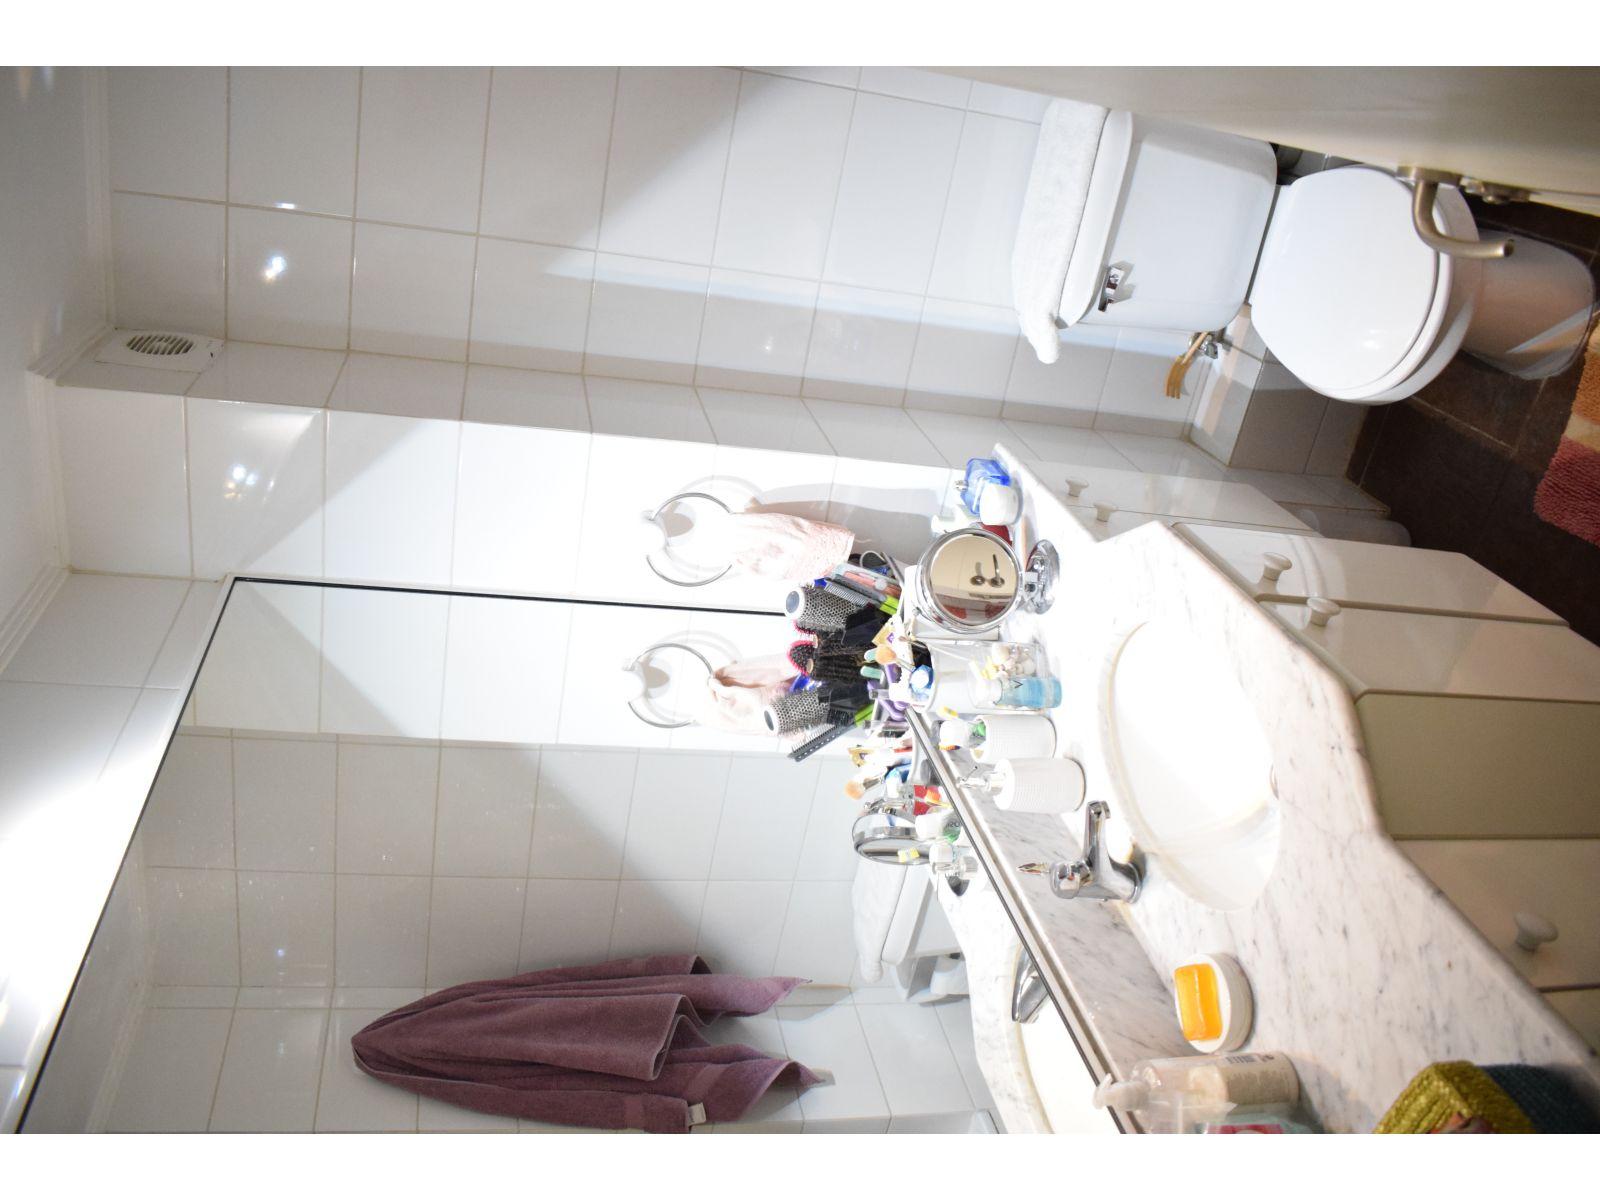 baño en suite - 9 de 17